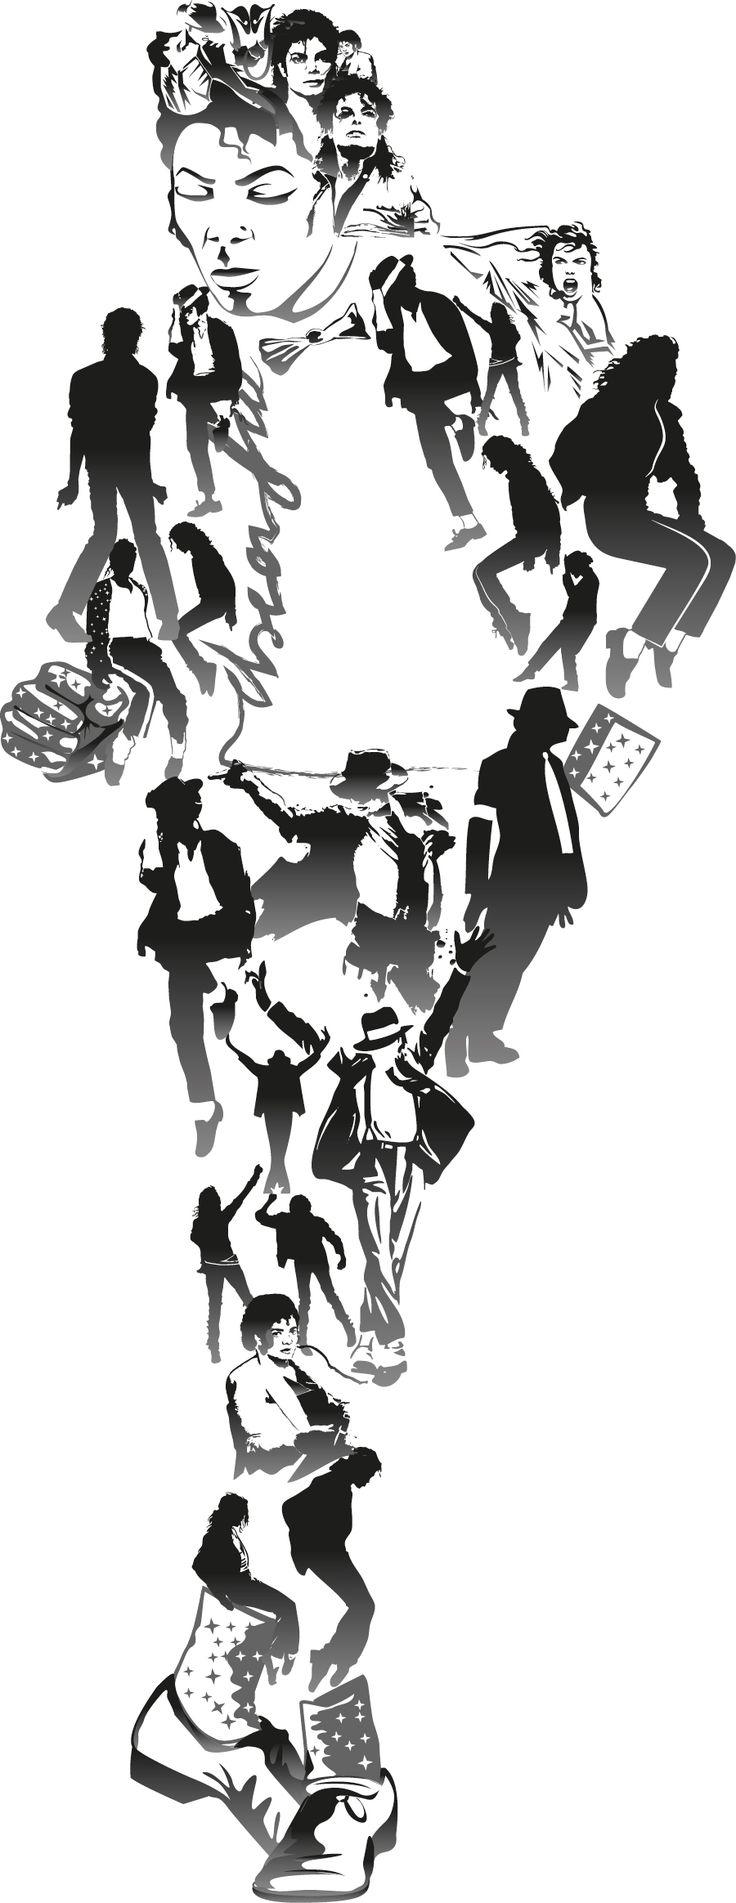 michael+jackson+silhouette | Micah Prose Honours Michael Jackson